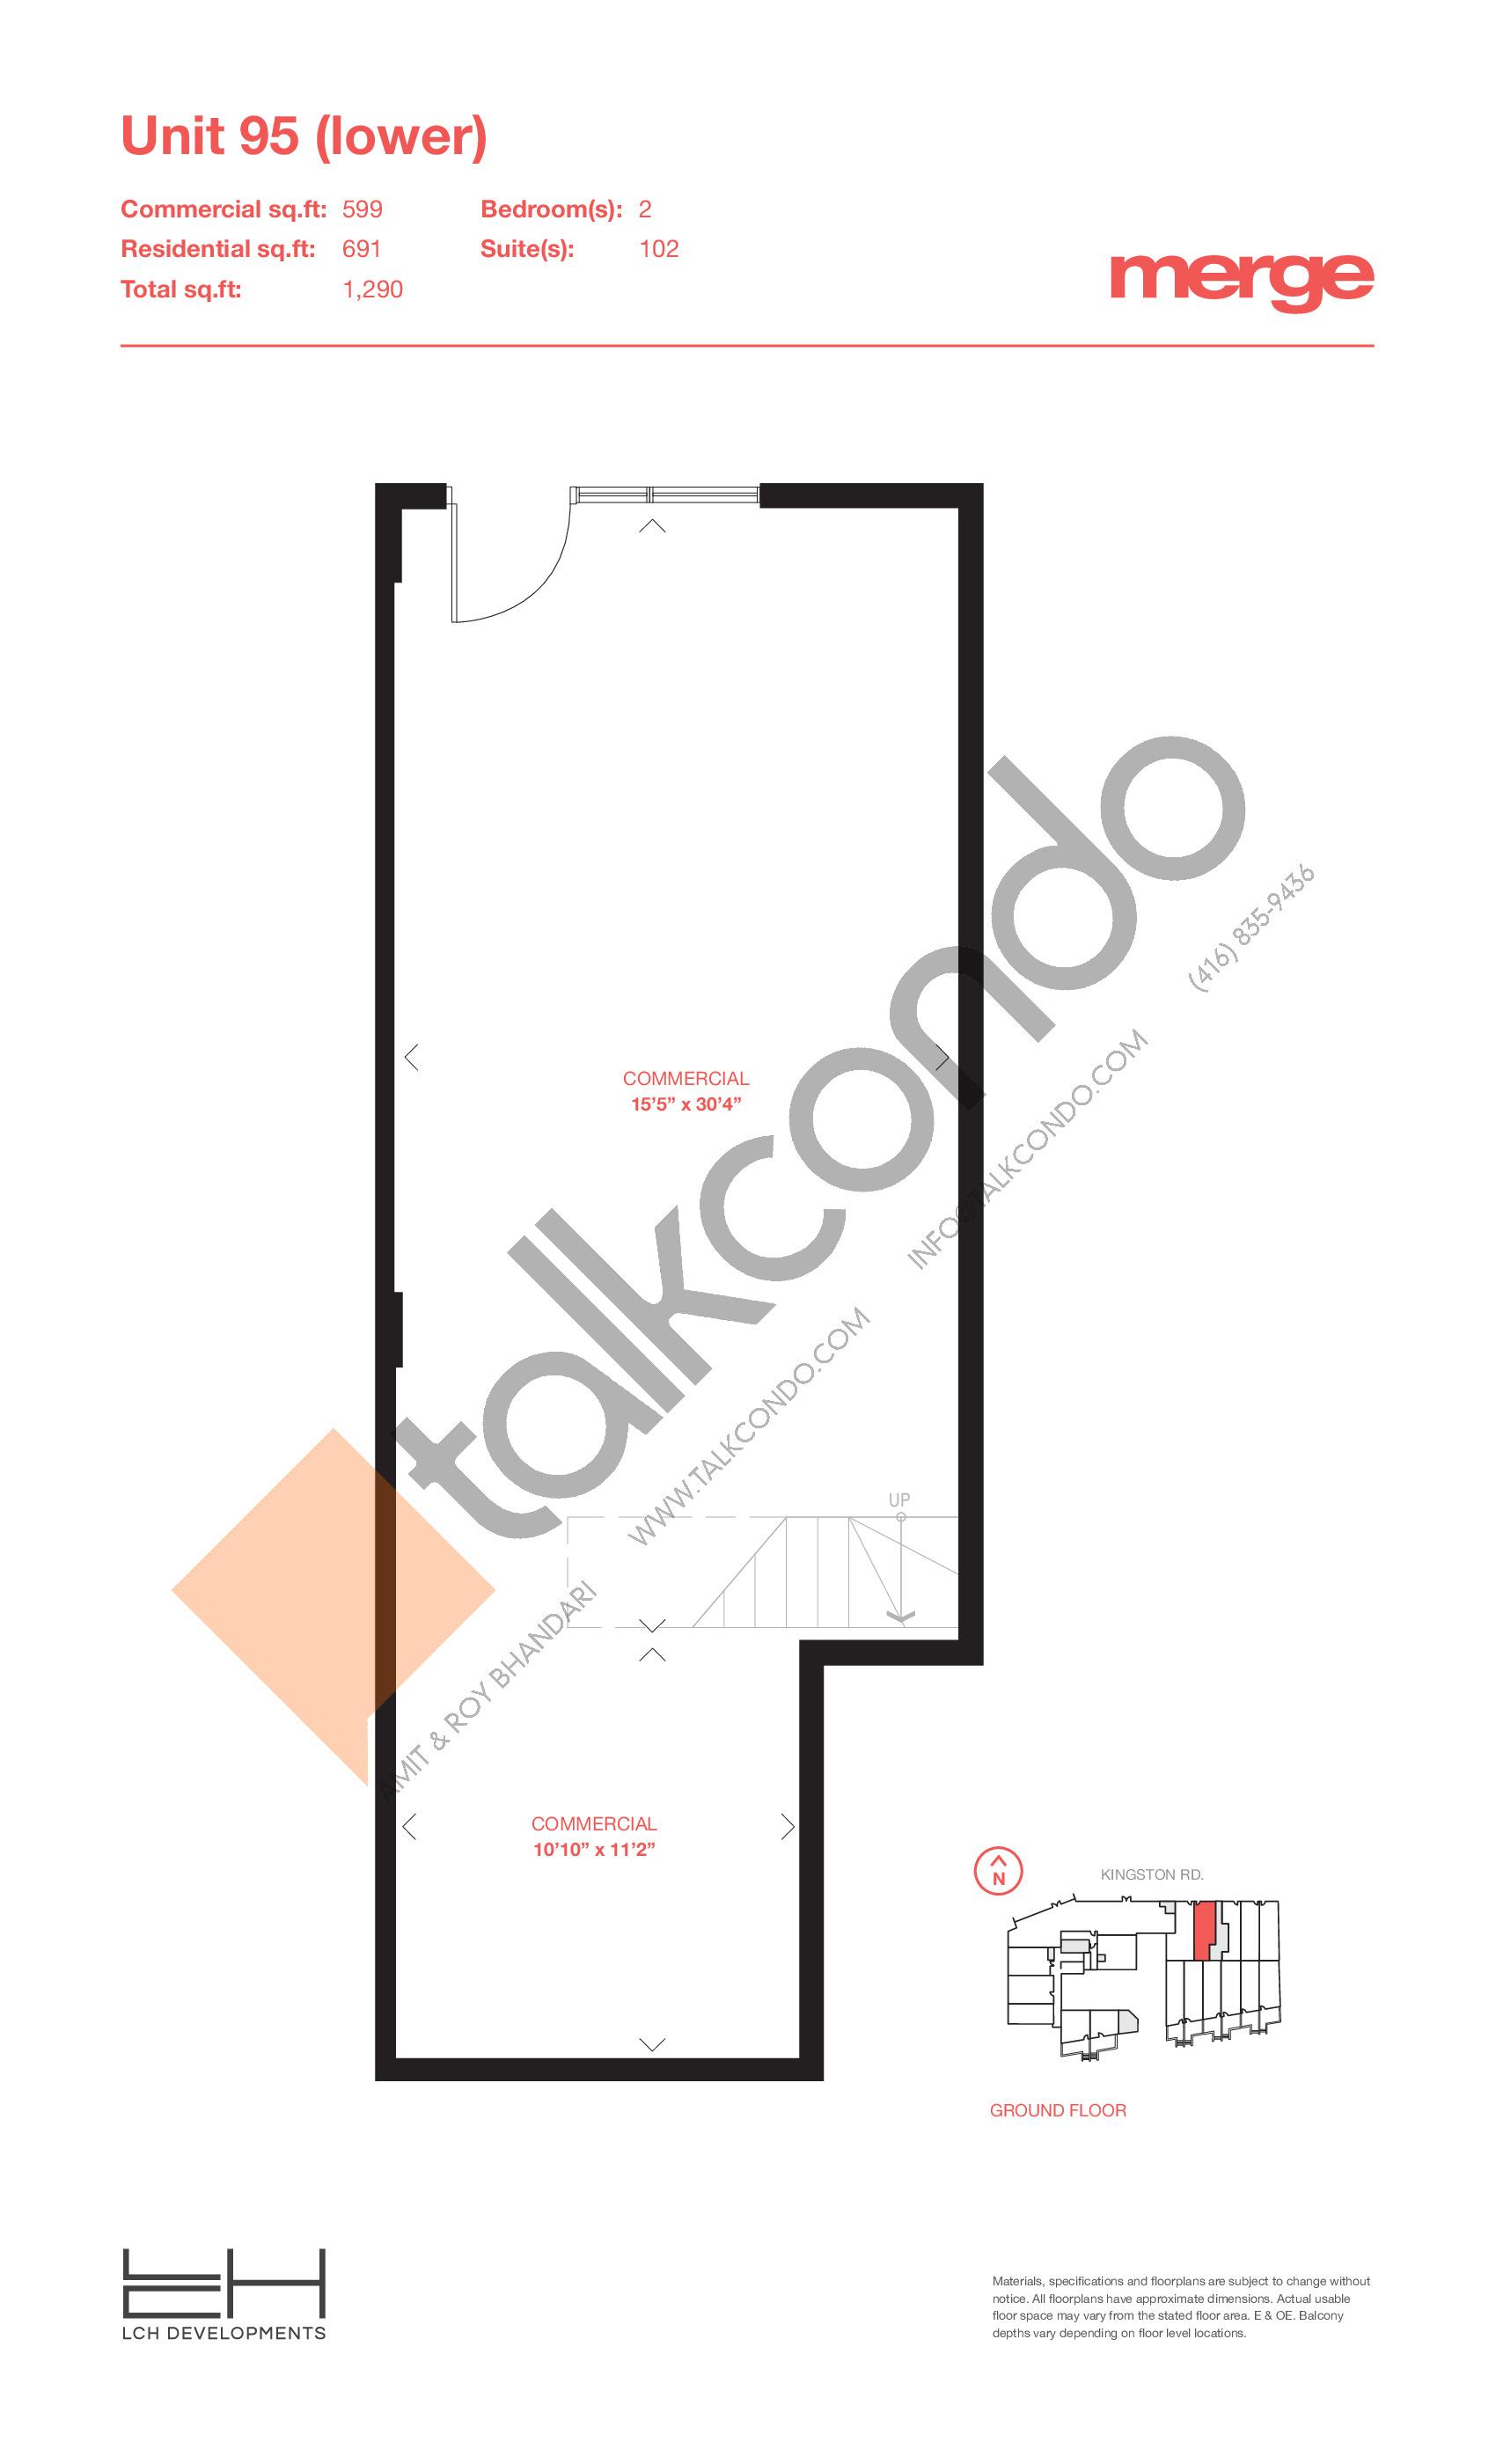 Unit 95 (Lower) - Livework Floor Plan at Merge Condos - 1290 sq.ft